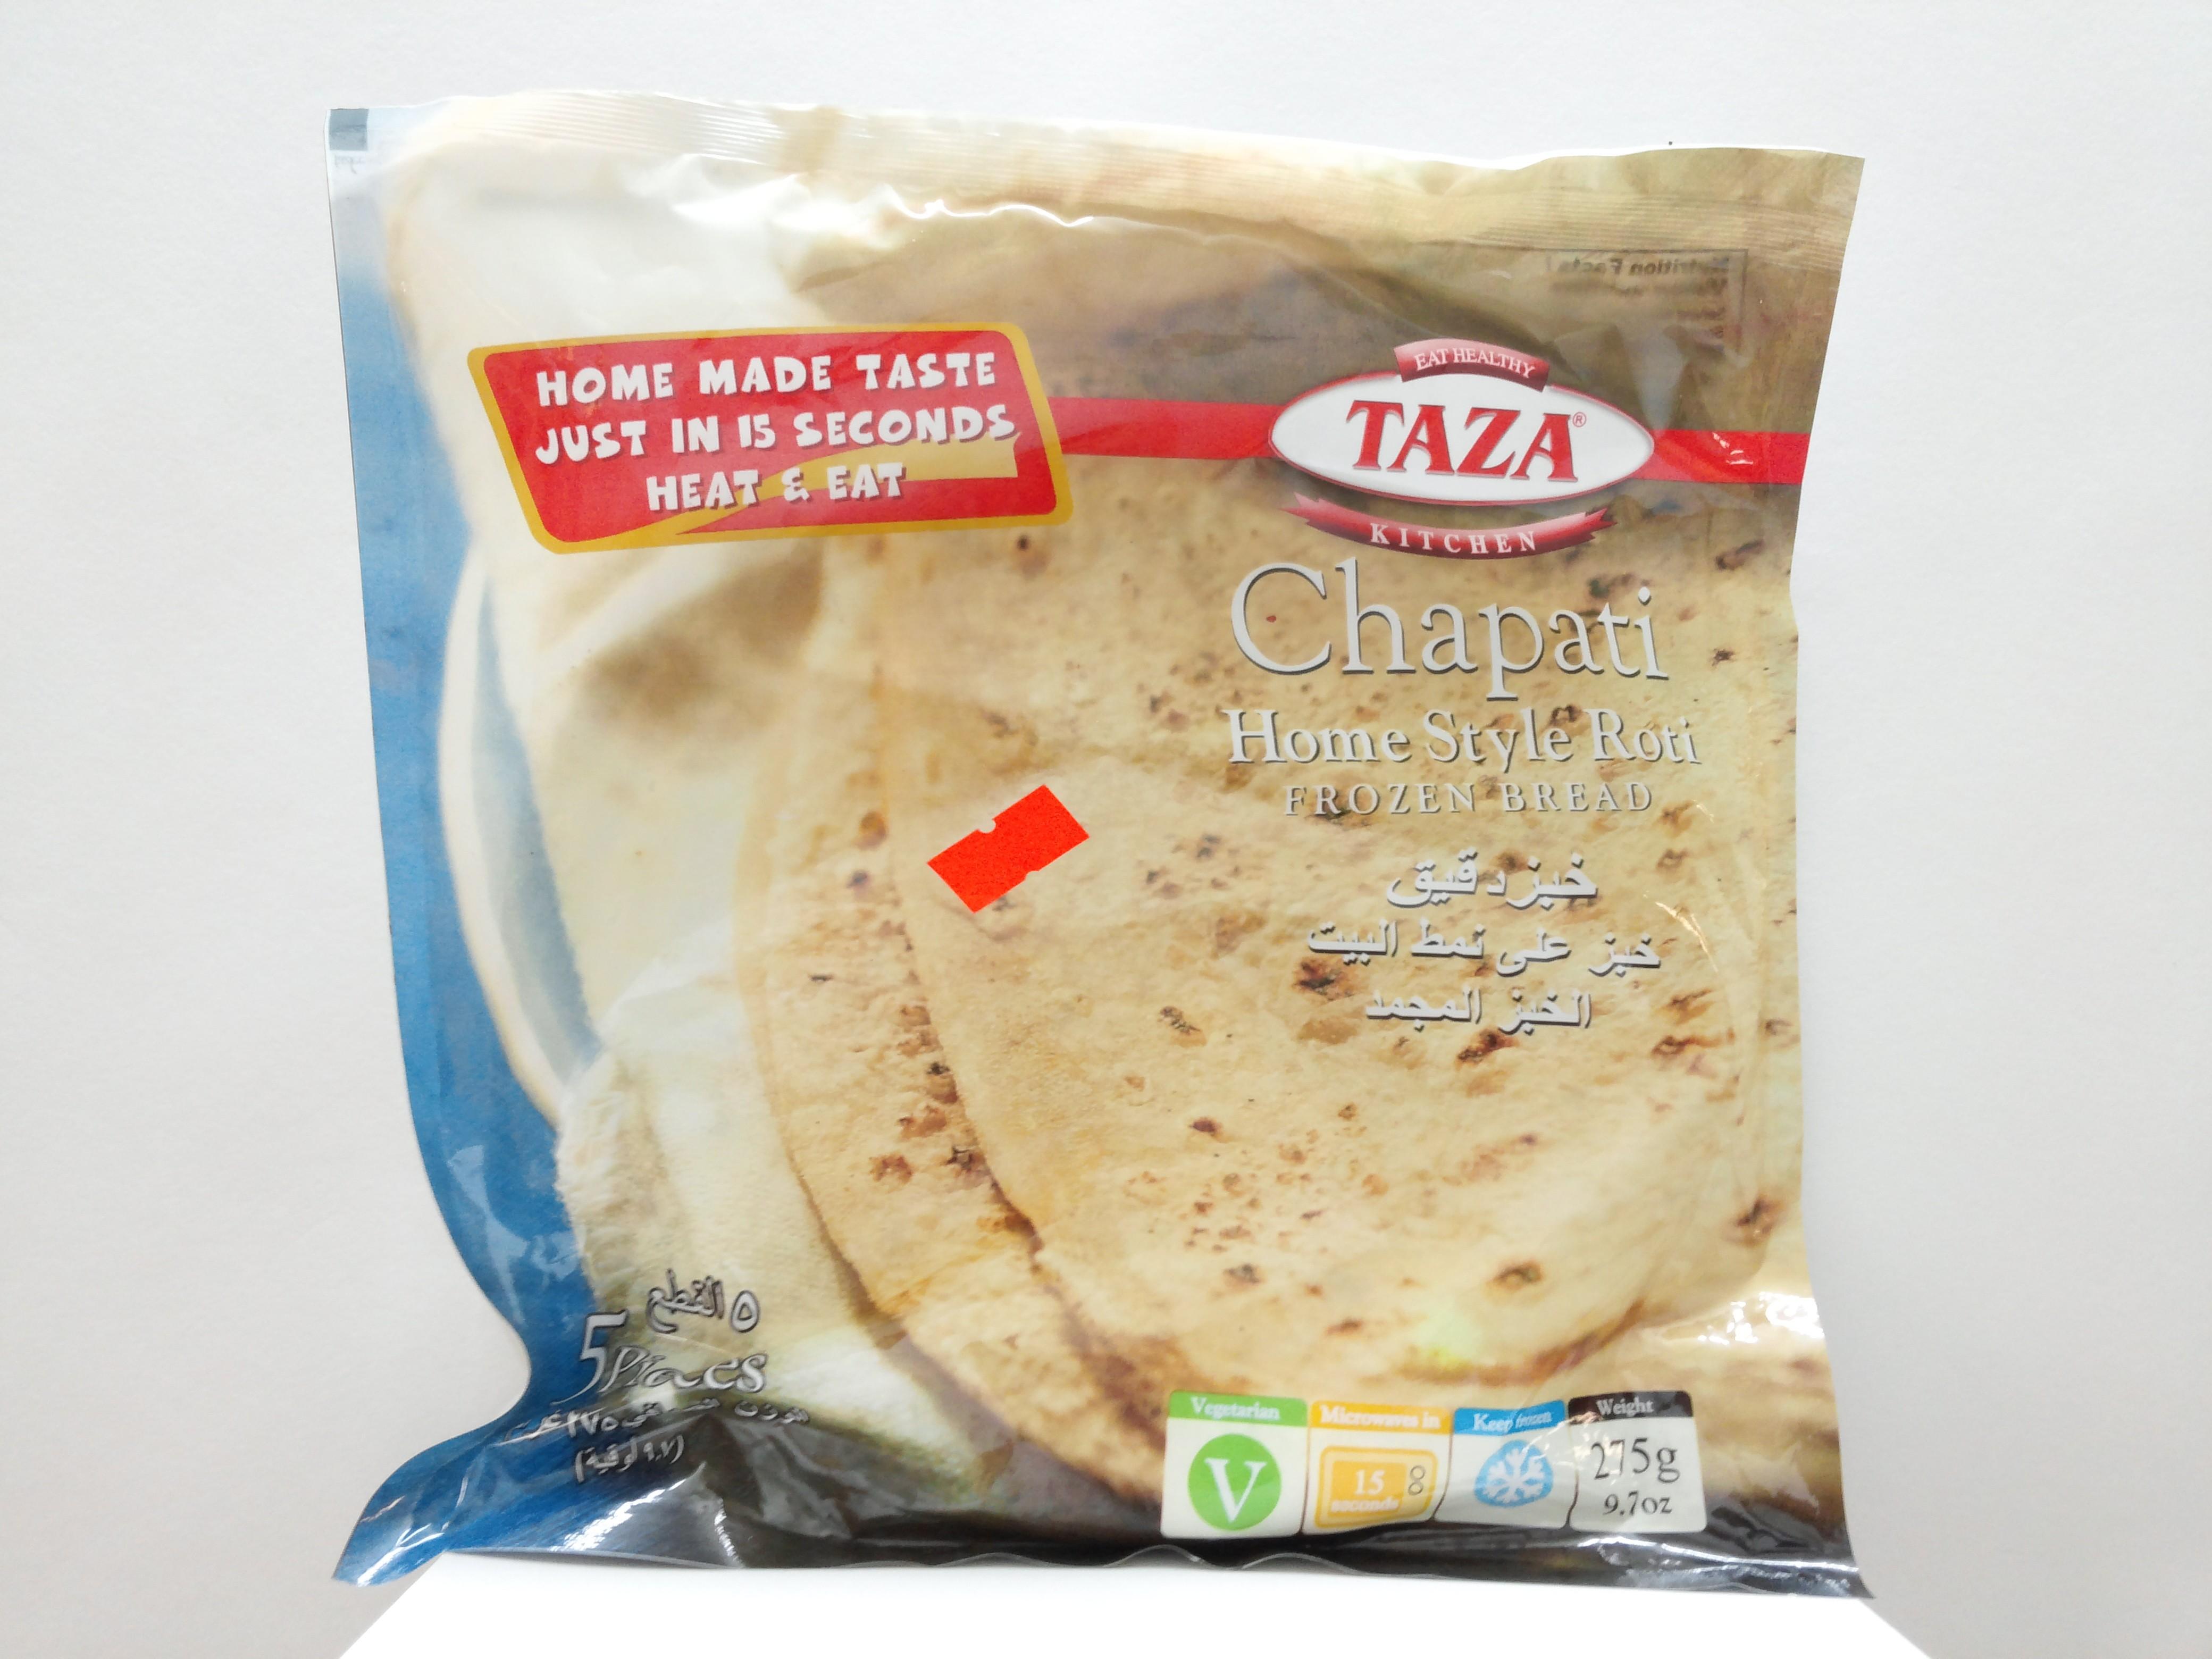 Taza Chapati Home Style Roti 5 Pcs 9.7 oz